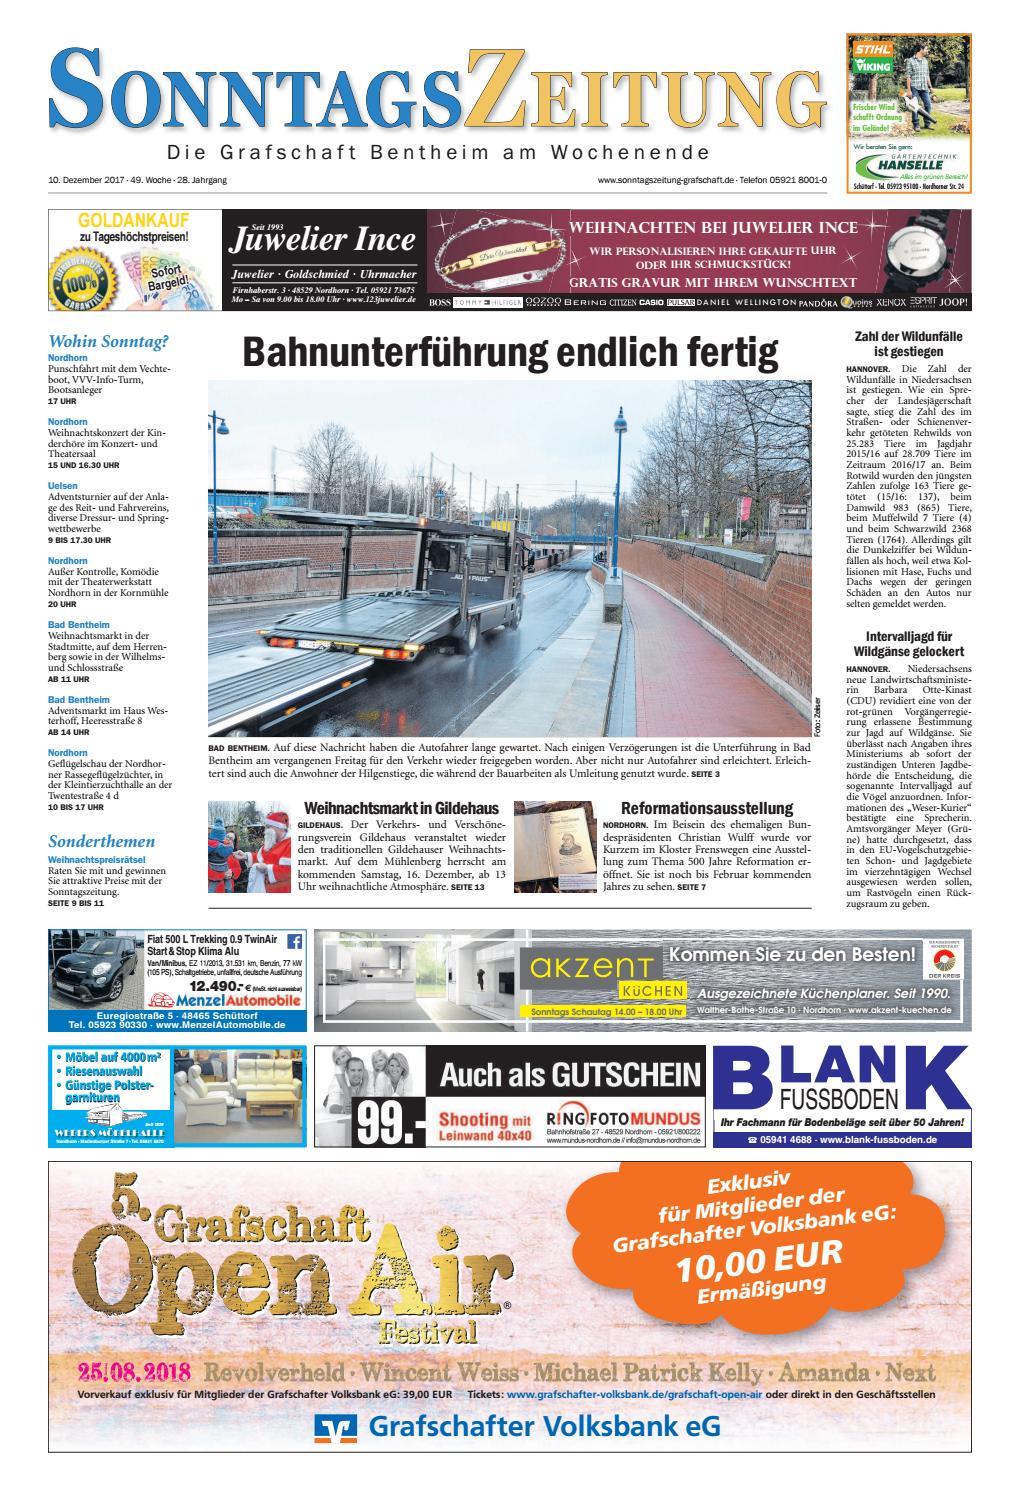 SonntagsZeitung_10-12-2017 by SonntagsZeitung - issuu